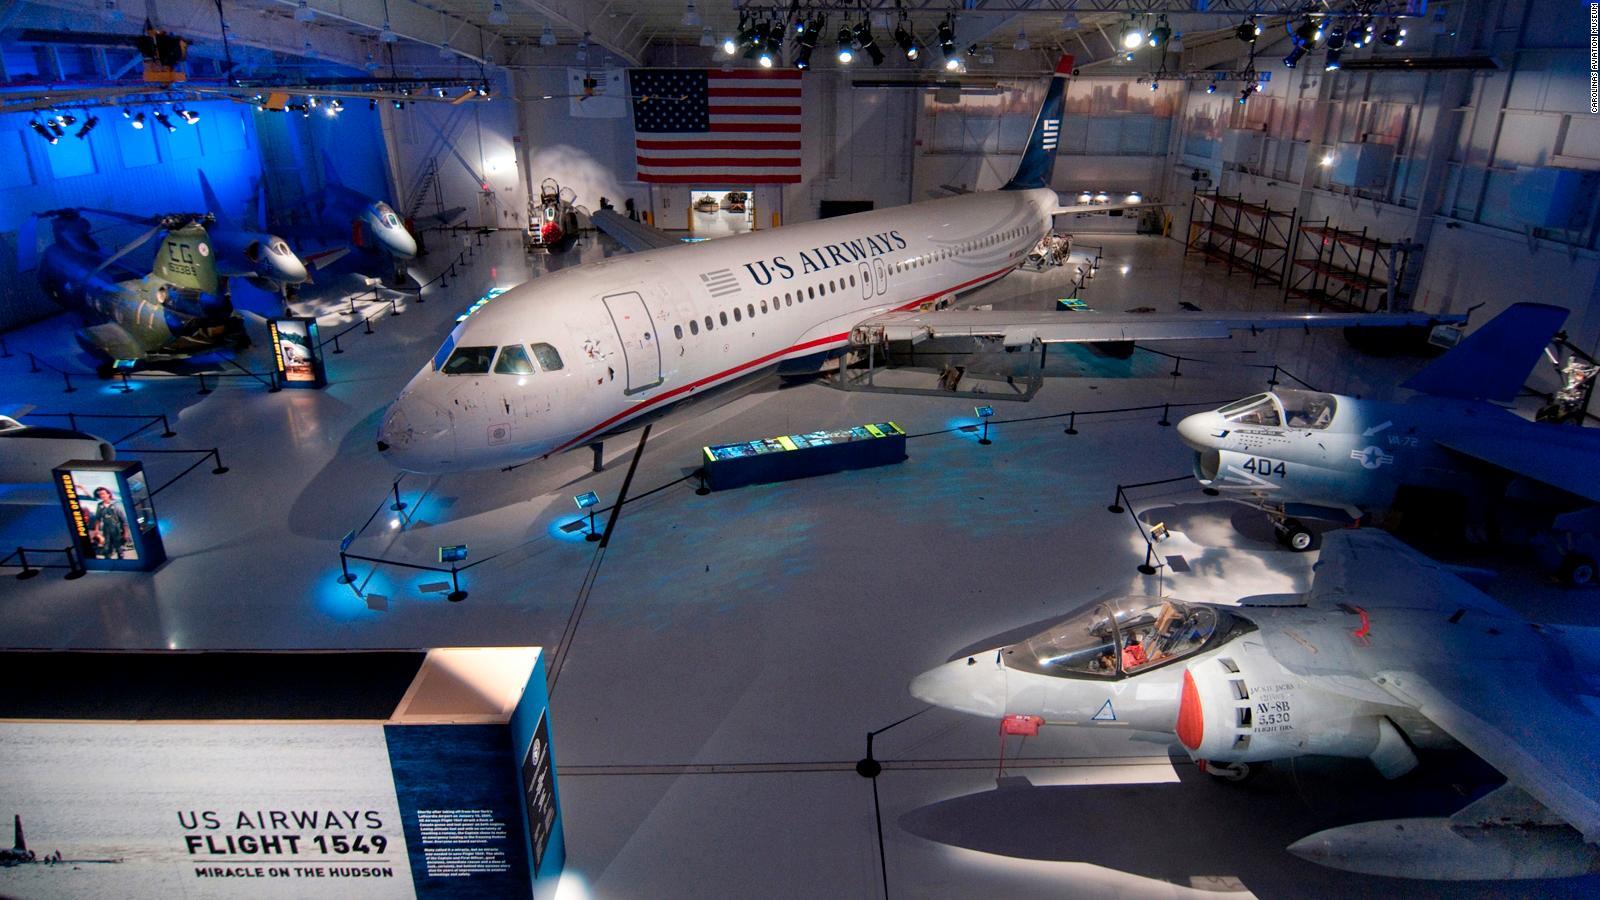 20 best aviation museums around the world | CNN Travel